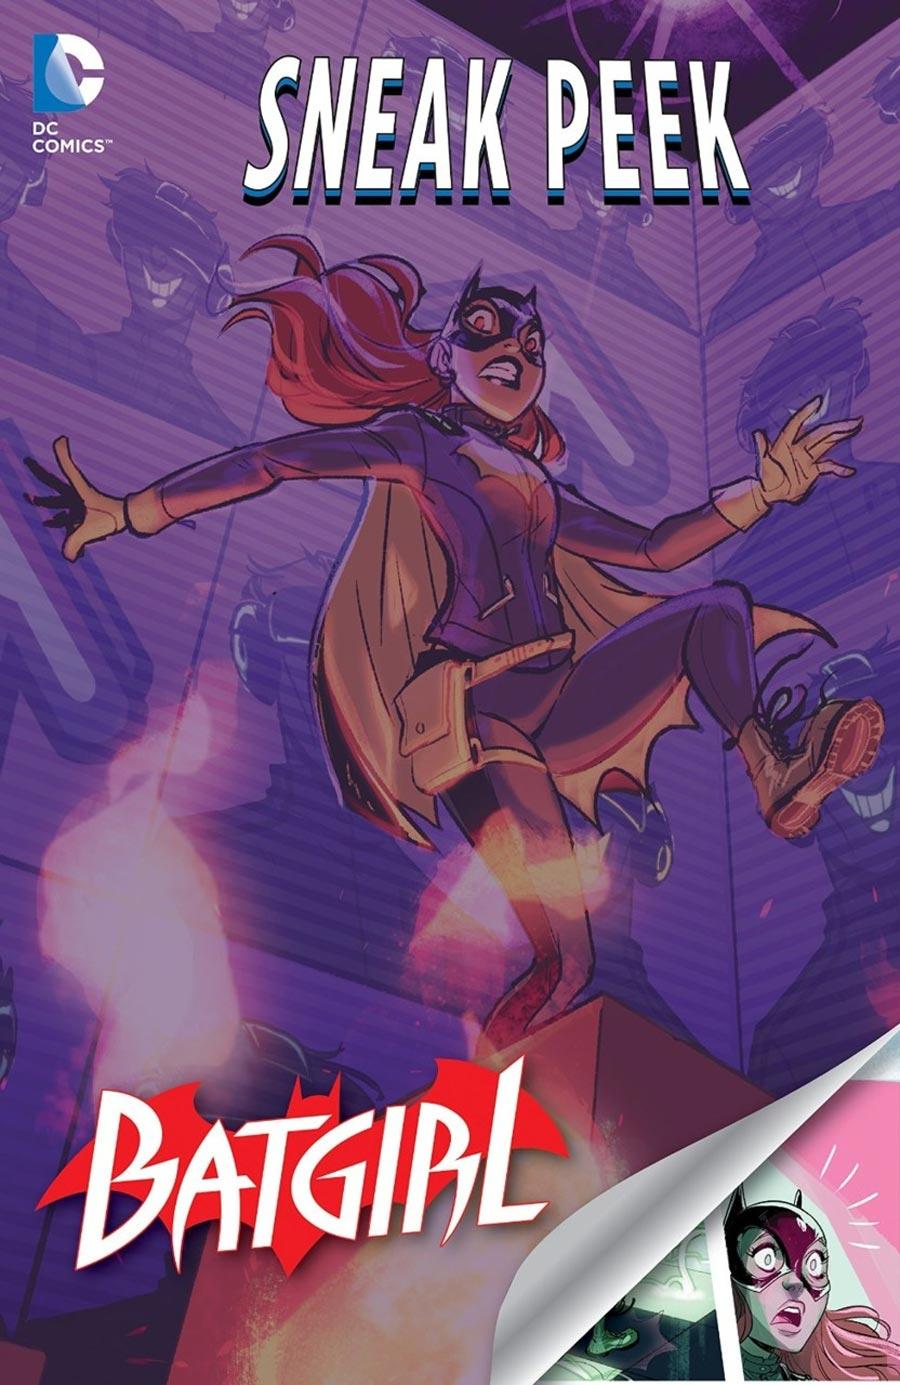 DC Sneak Peek - Batgirl 1